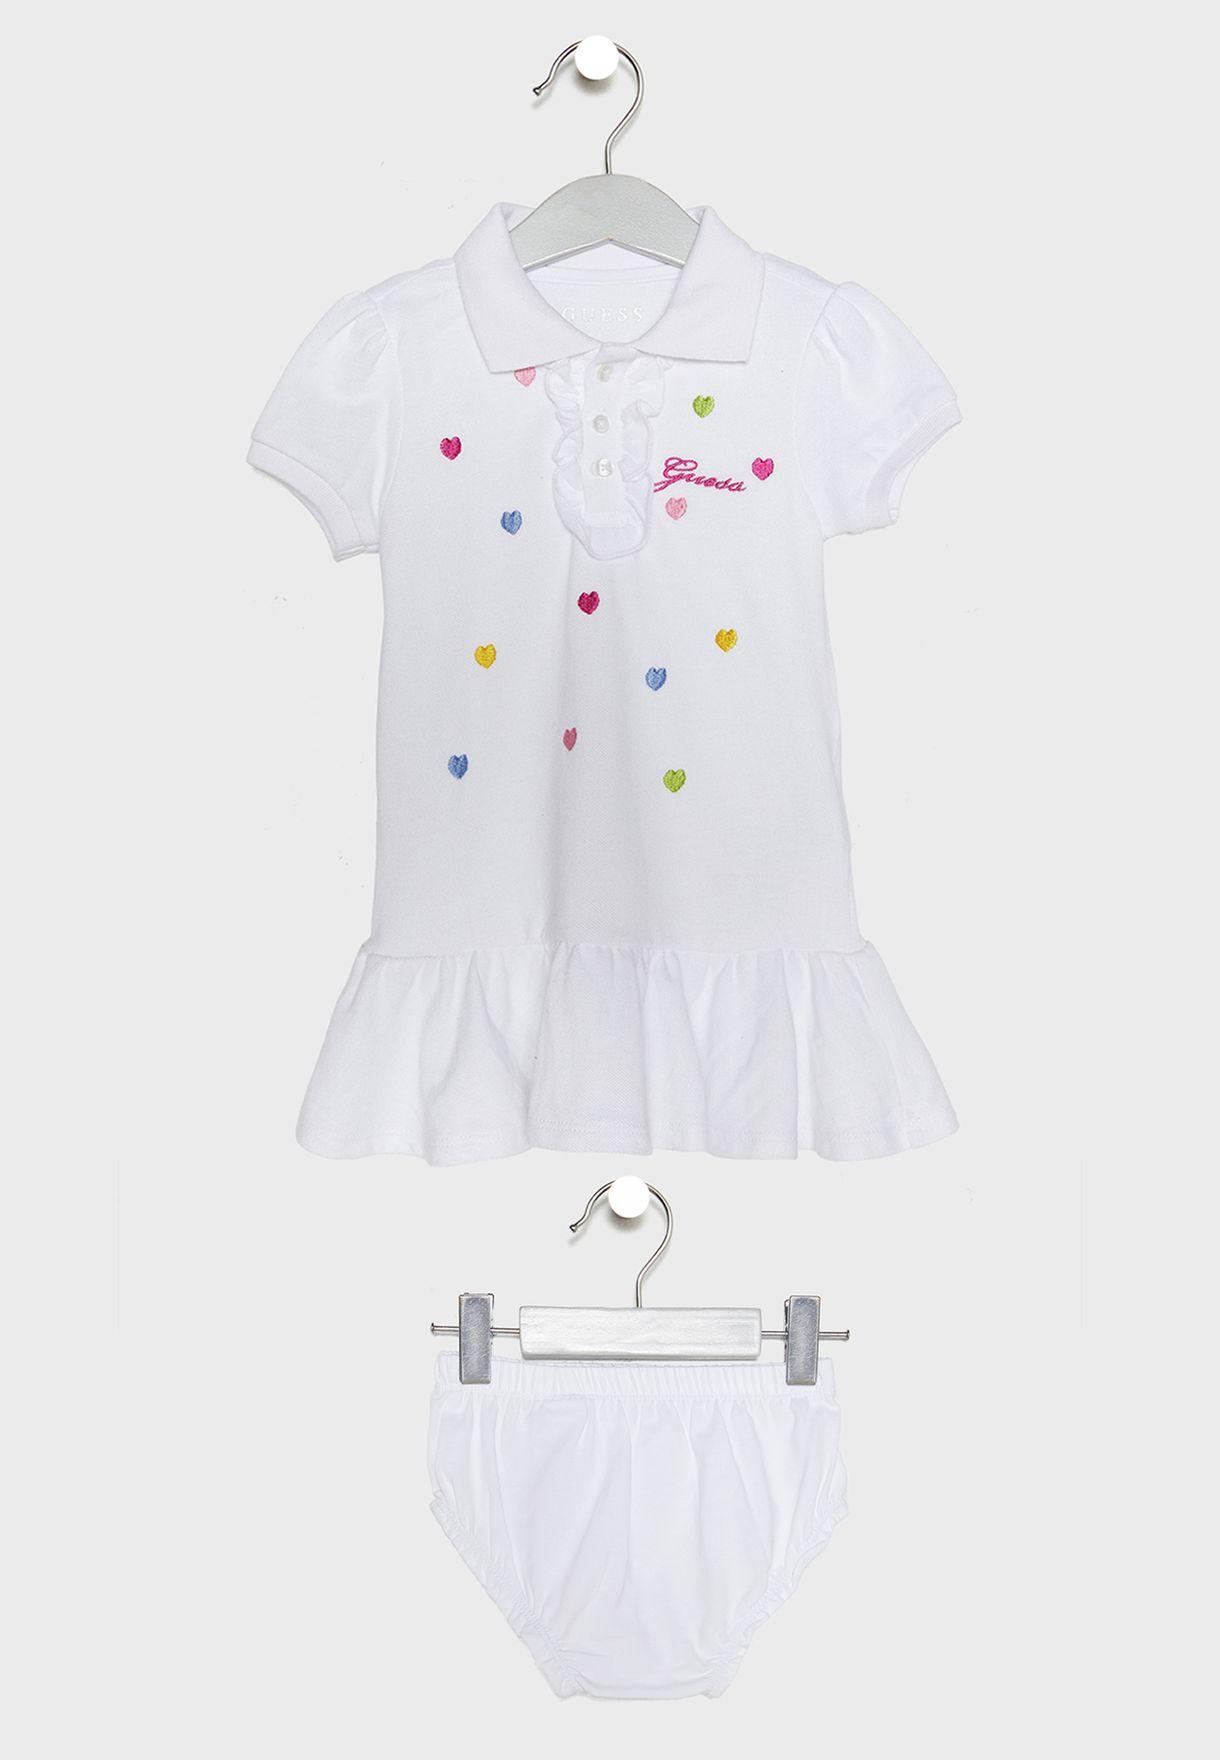 ecca298fc تسوق طقم (فستان + سروال) ماركة جيس لون أبيض A91K13K83I0 في عمان -  10064AT69RDP